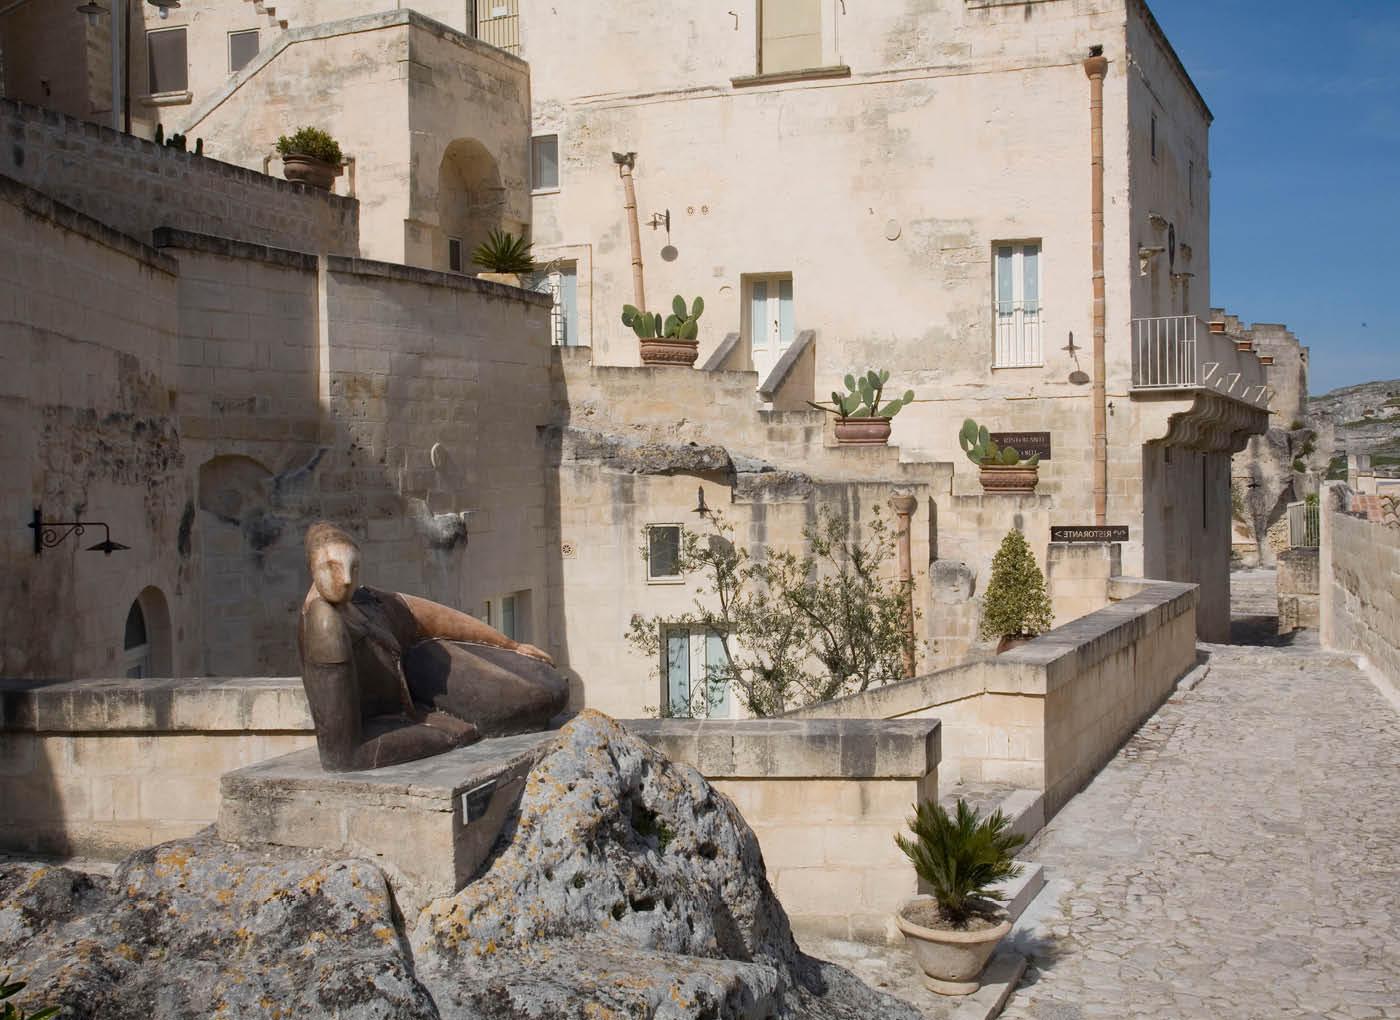 ristrutturazione-sant-angelo-luxury-resort-matera-paris-lecacls-15